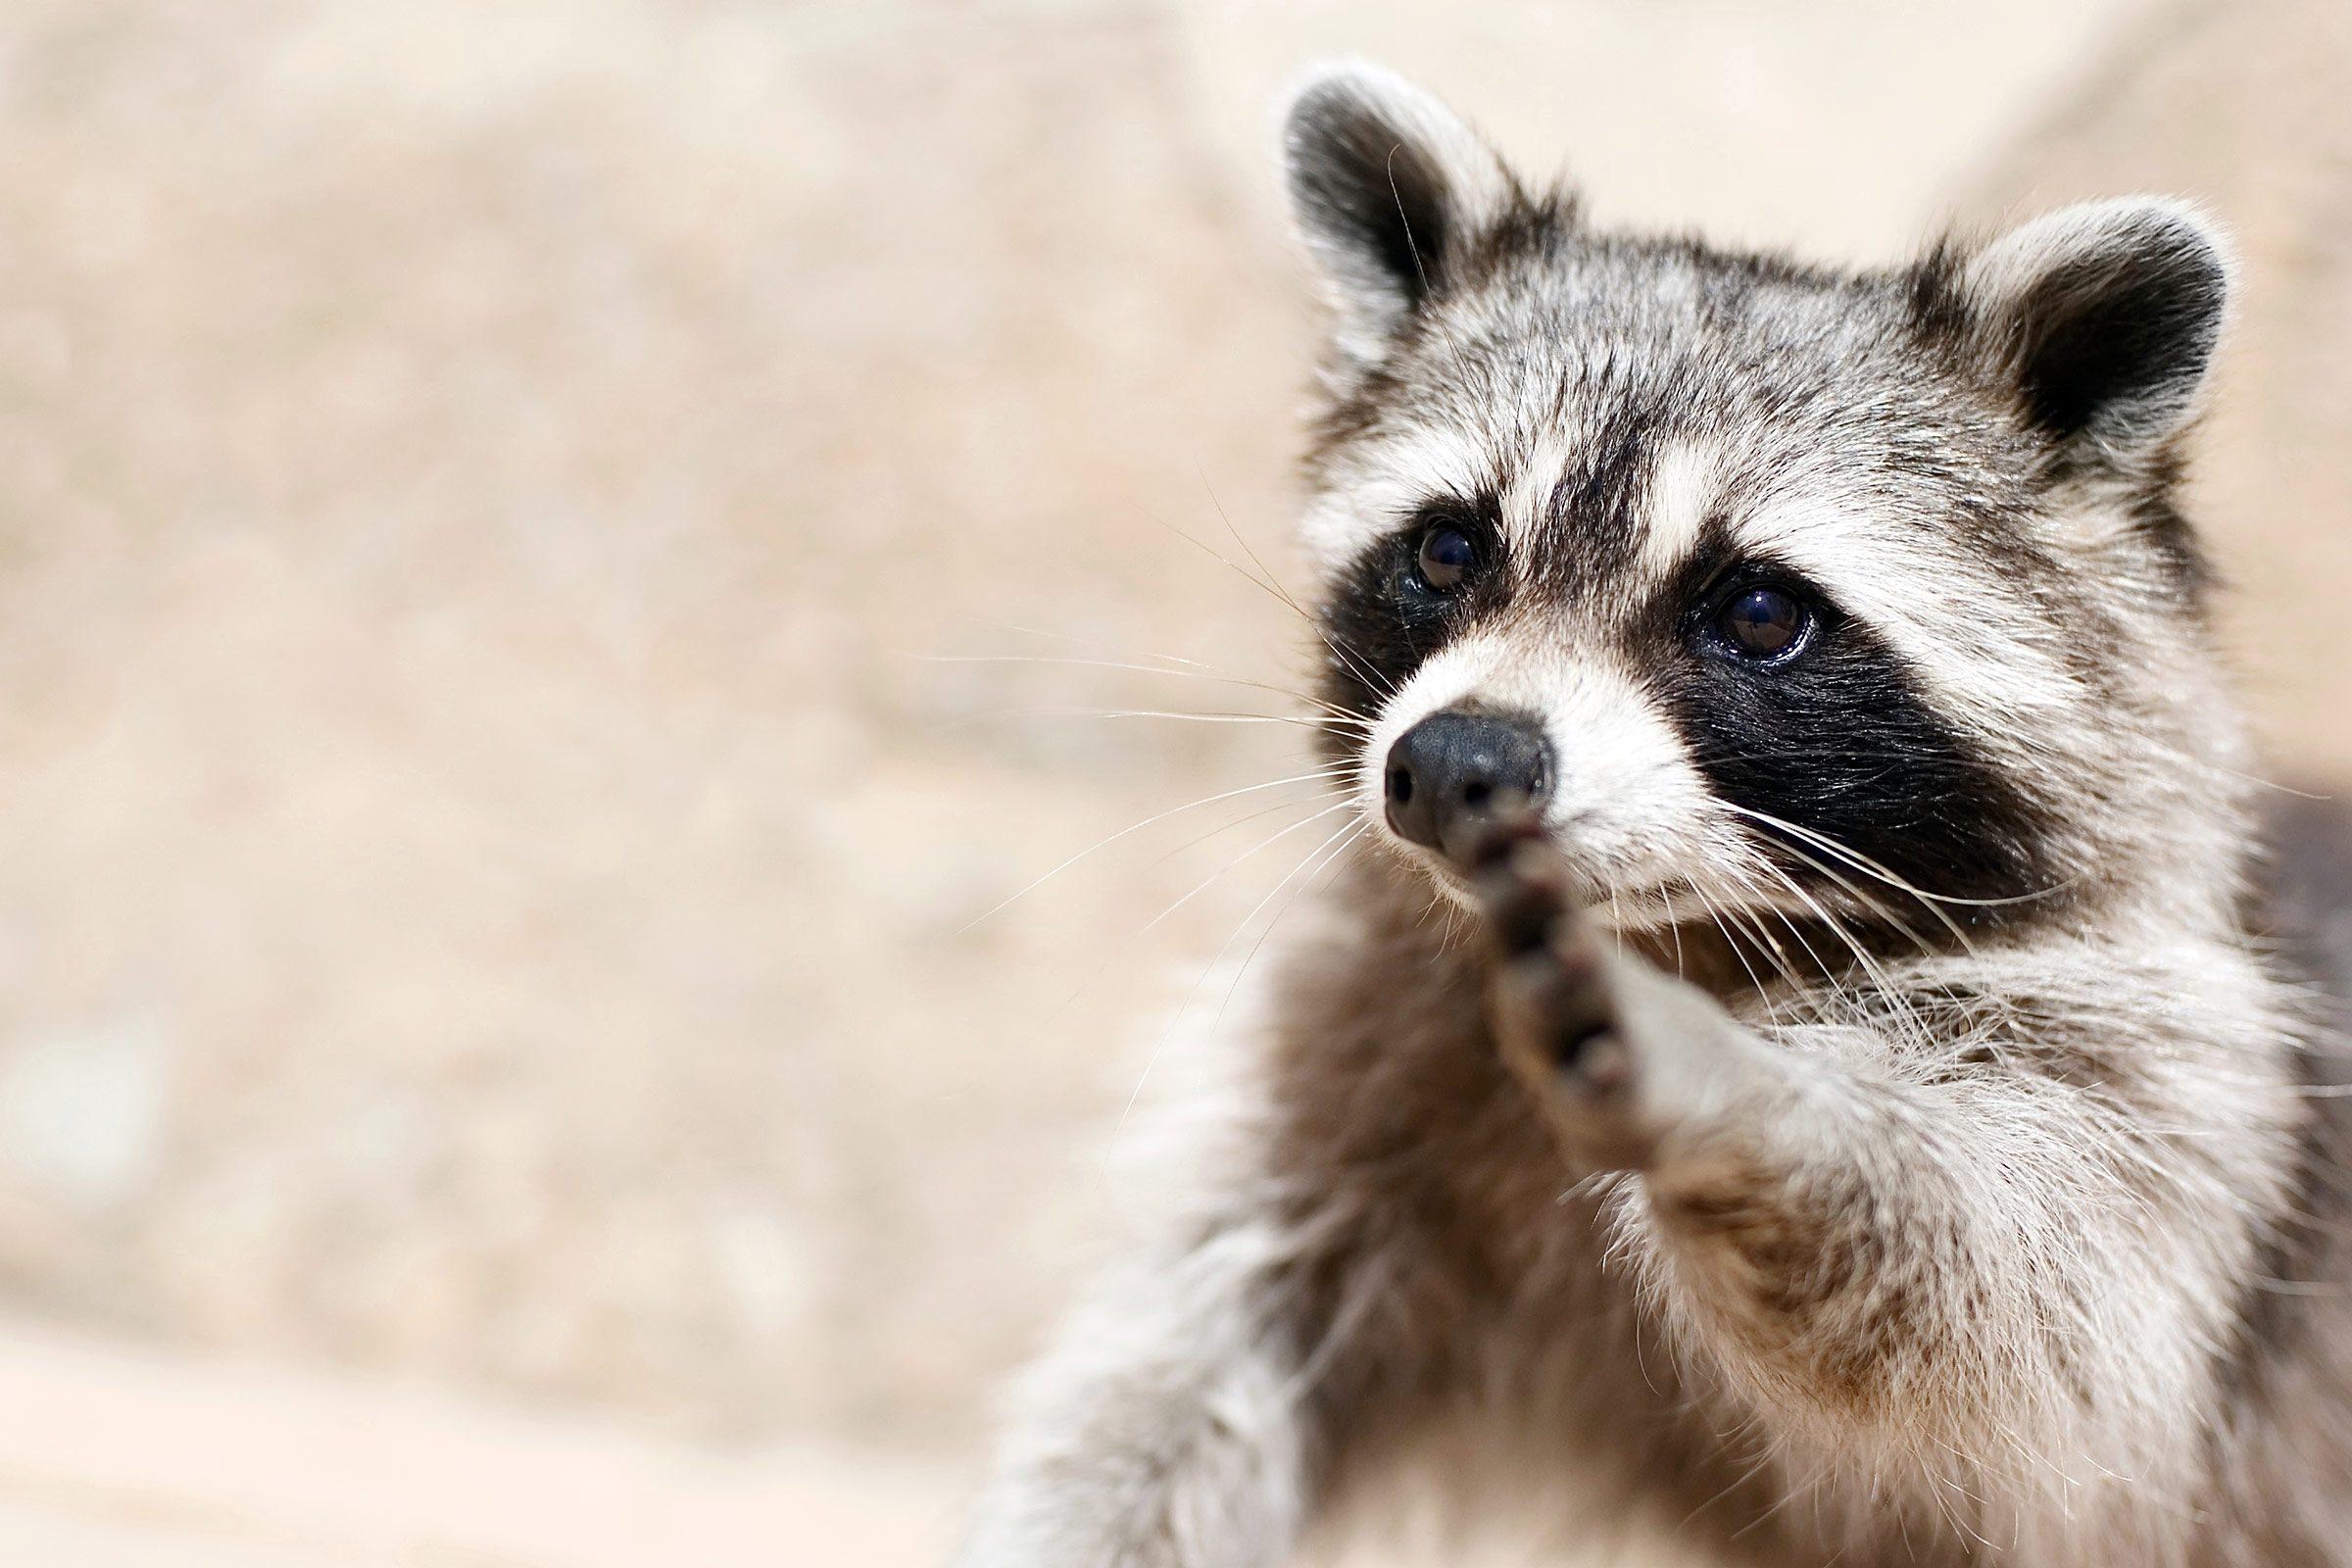 Smartest Animals 8 Species That Are Truly Genius